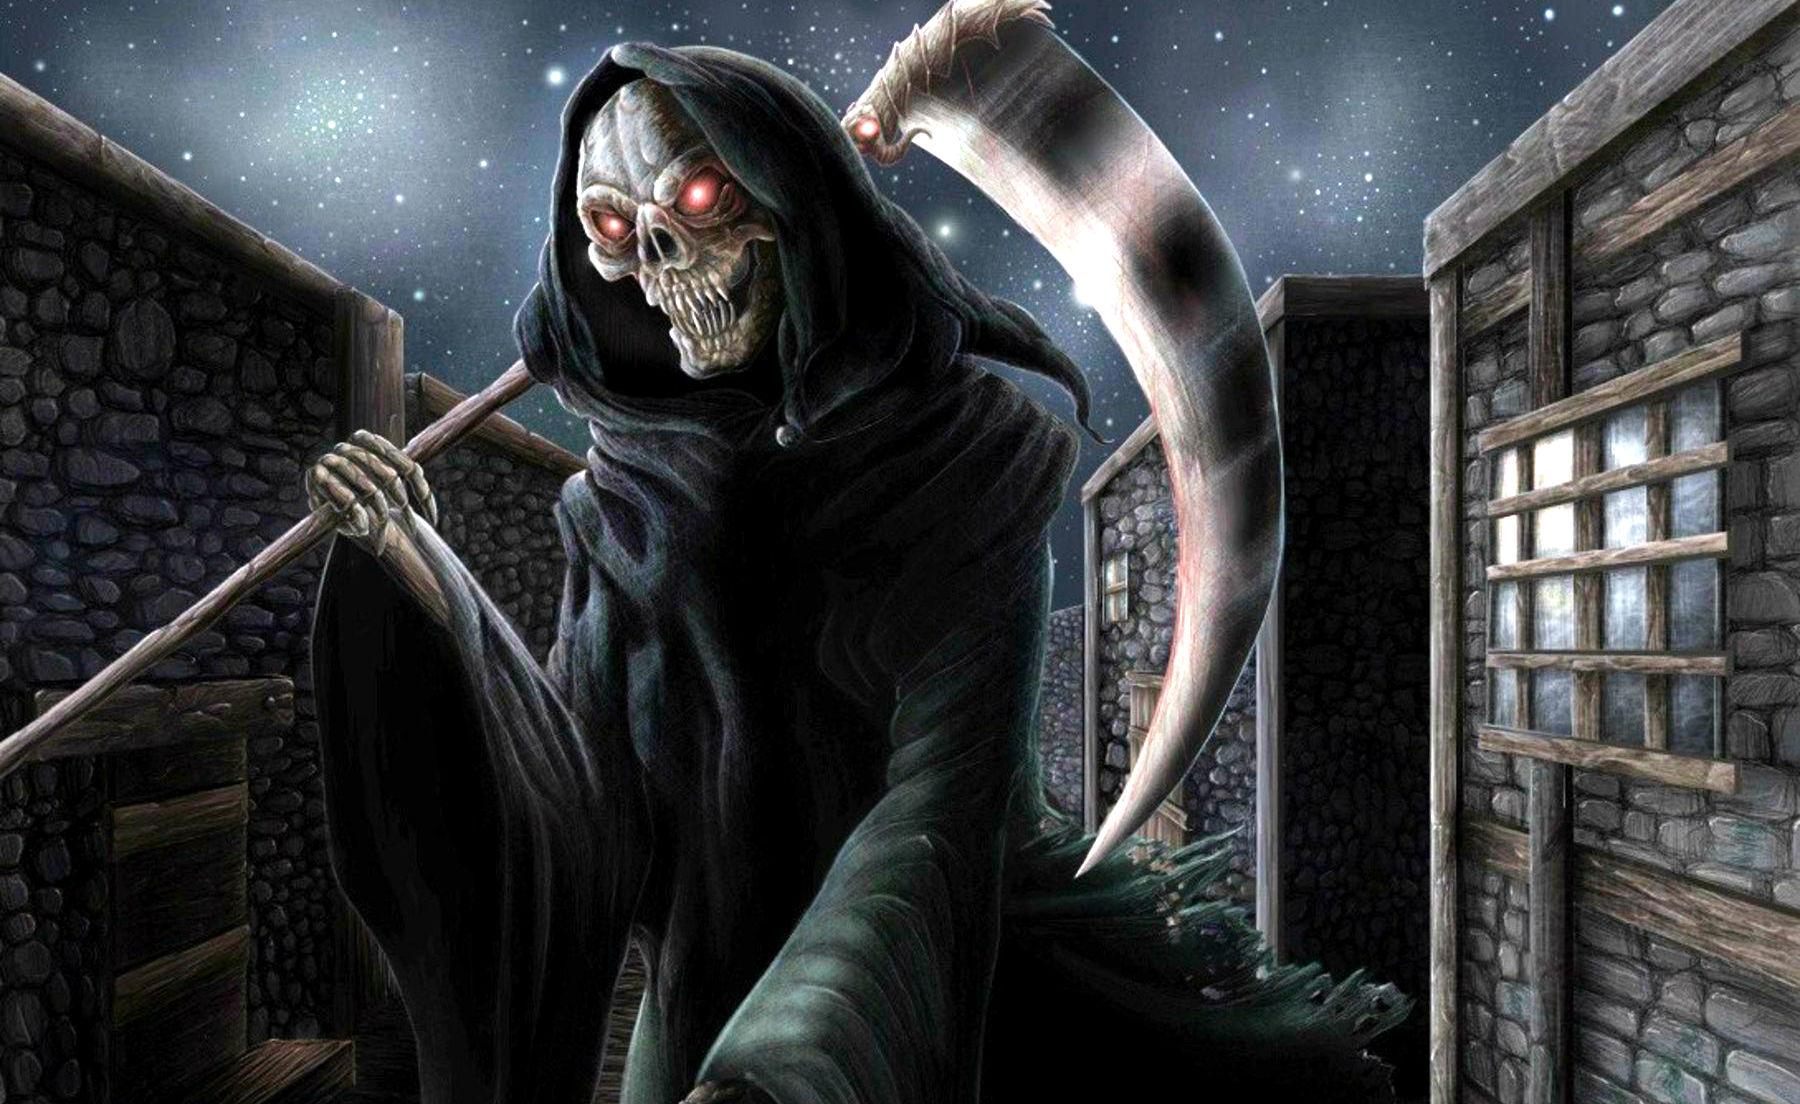 Dark Grim Reaper horror skeletons skull creepy r wallpaper 1800x1104 1800x1104